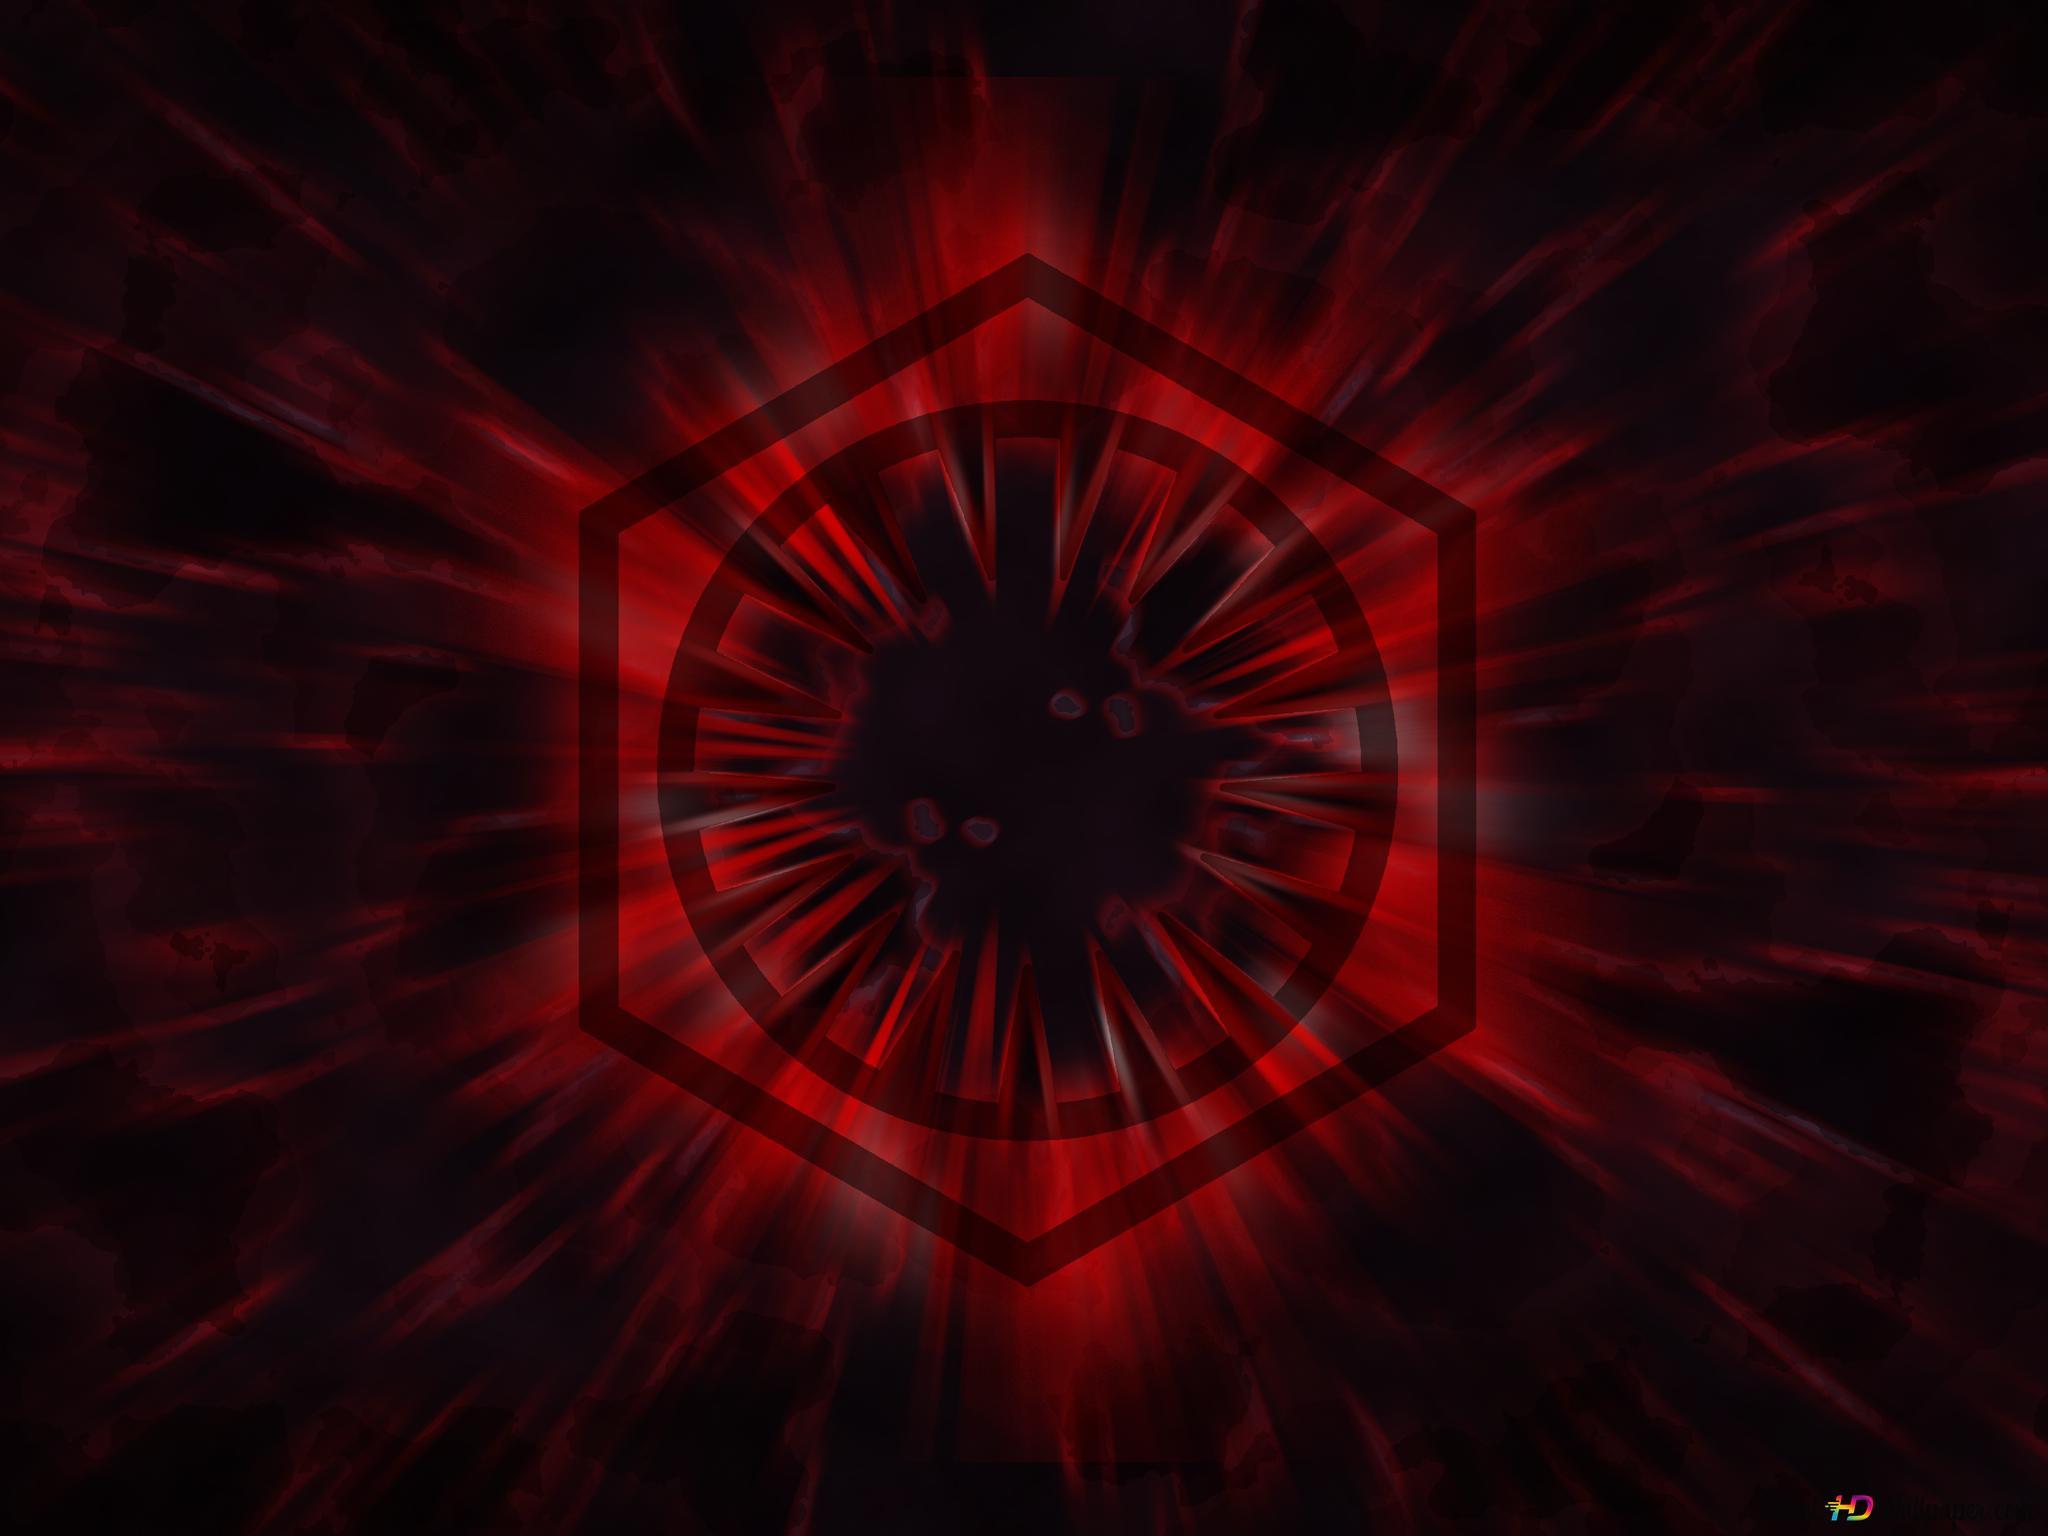 First Order Star Wars Hd Wallpaper Download